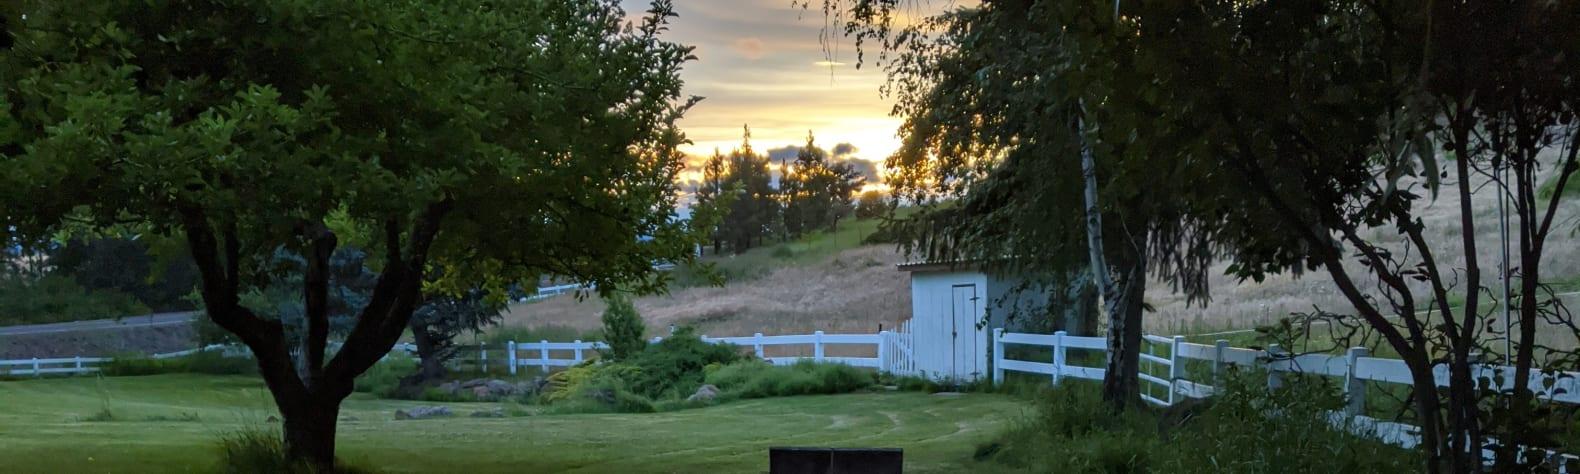 Dream Acres Homestead